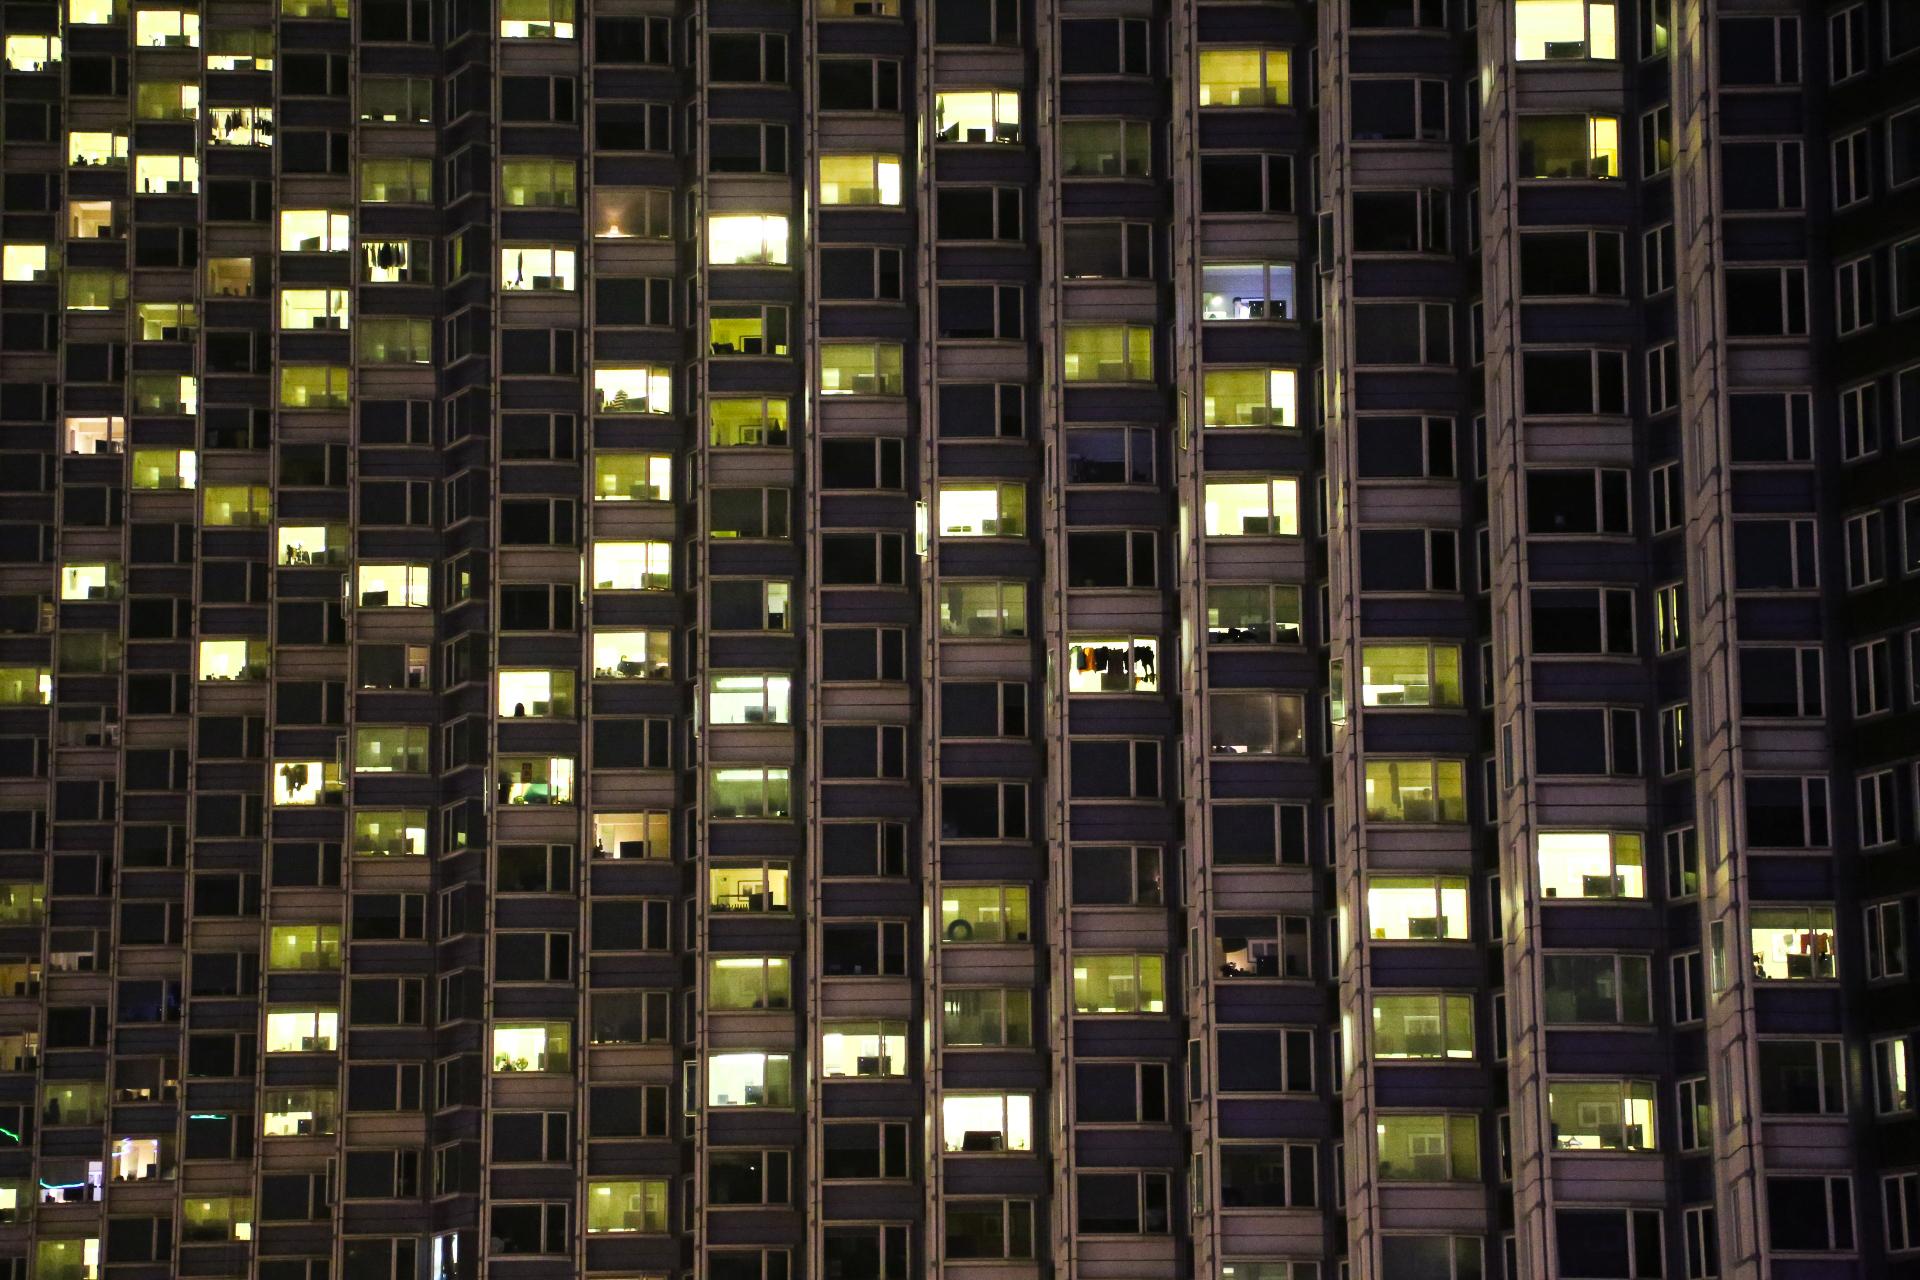 Hong Kong 2013 # 06